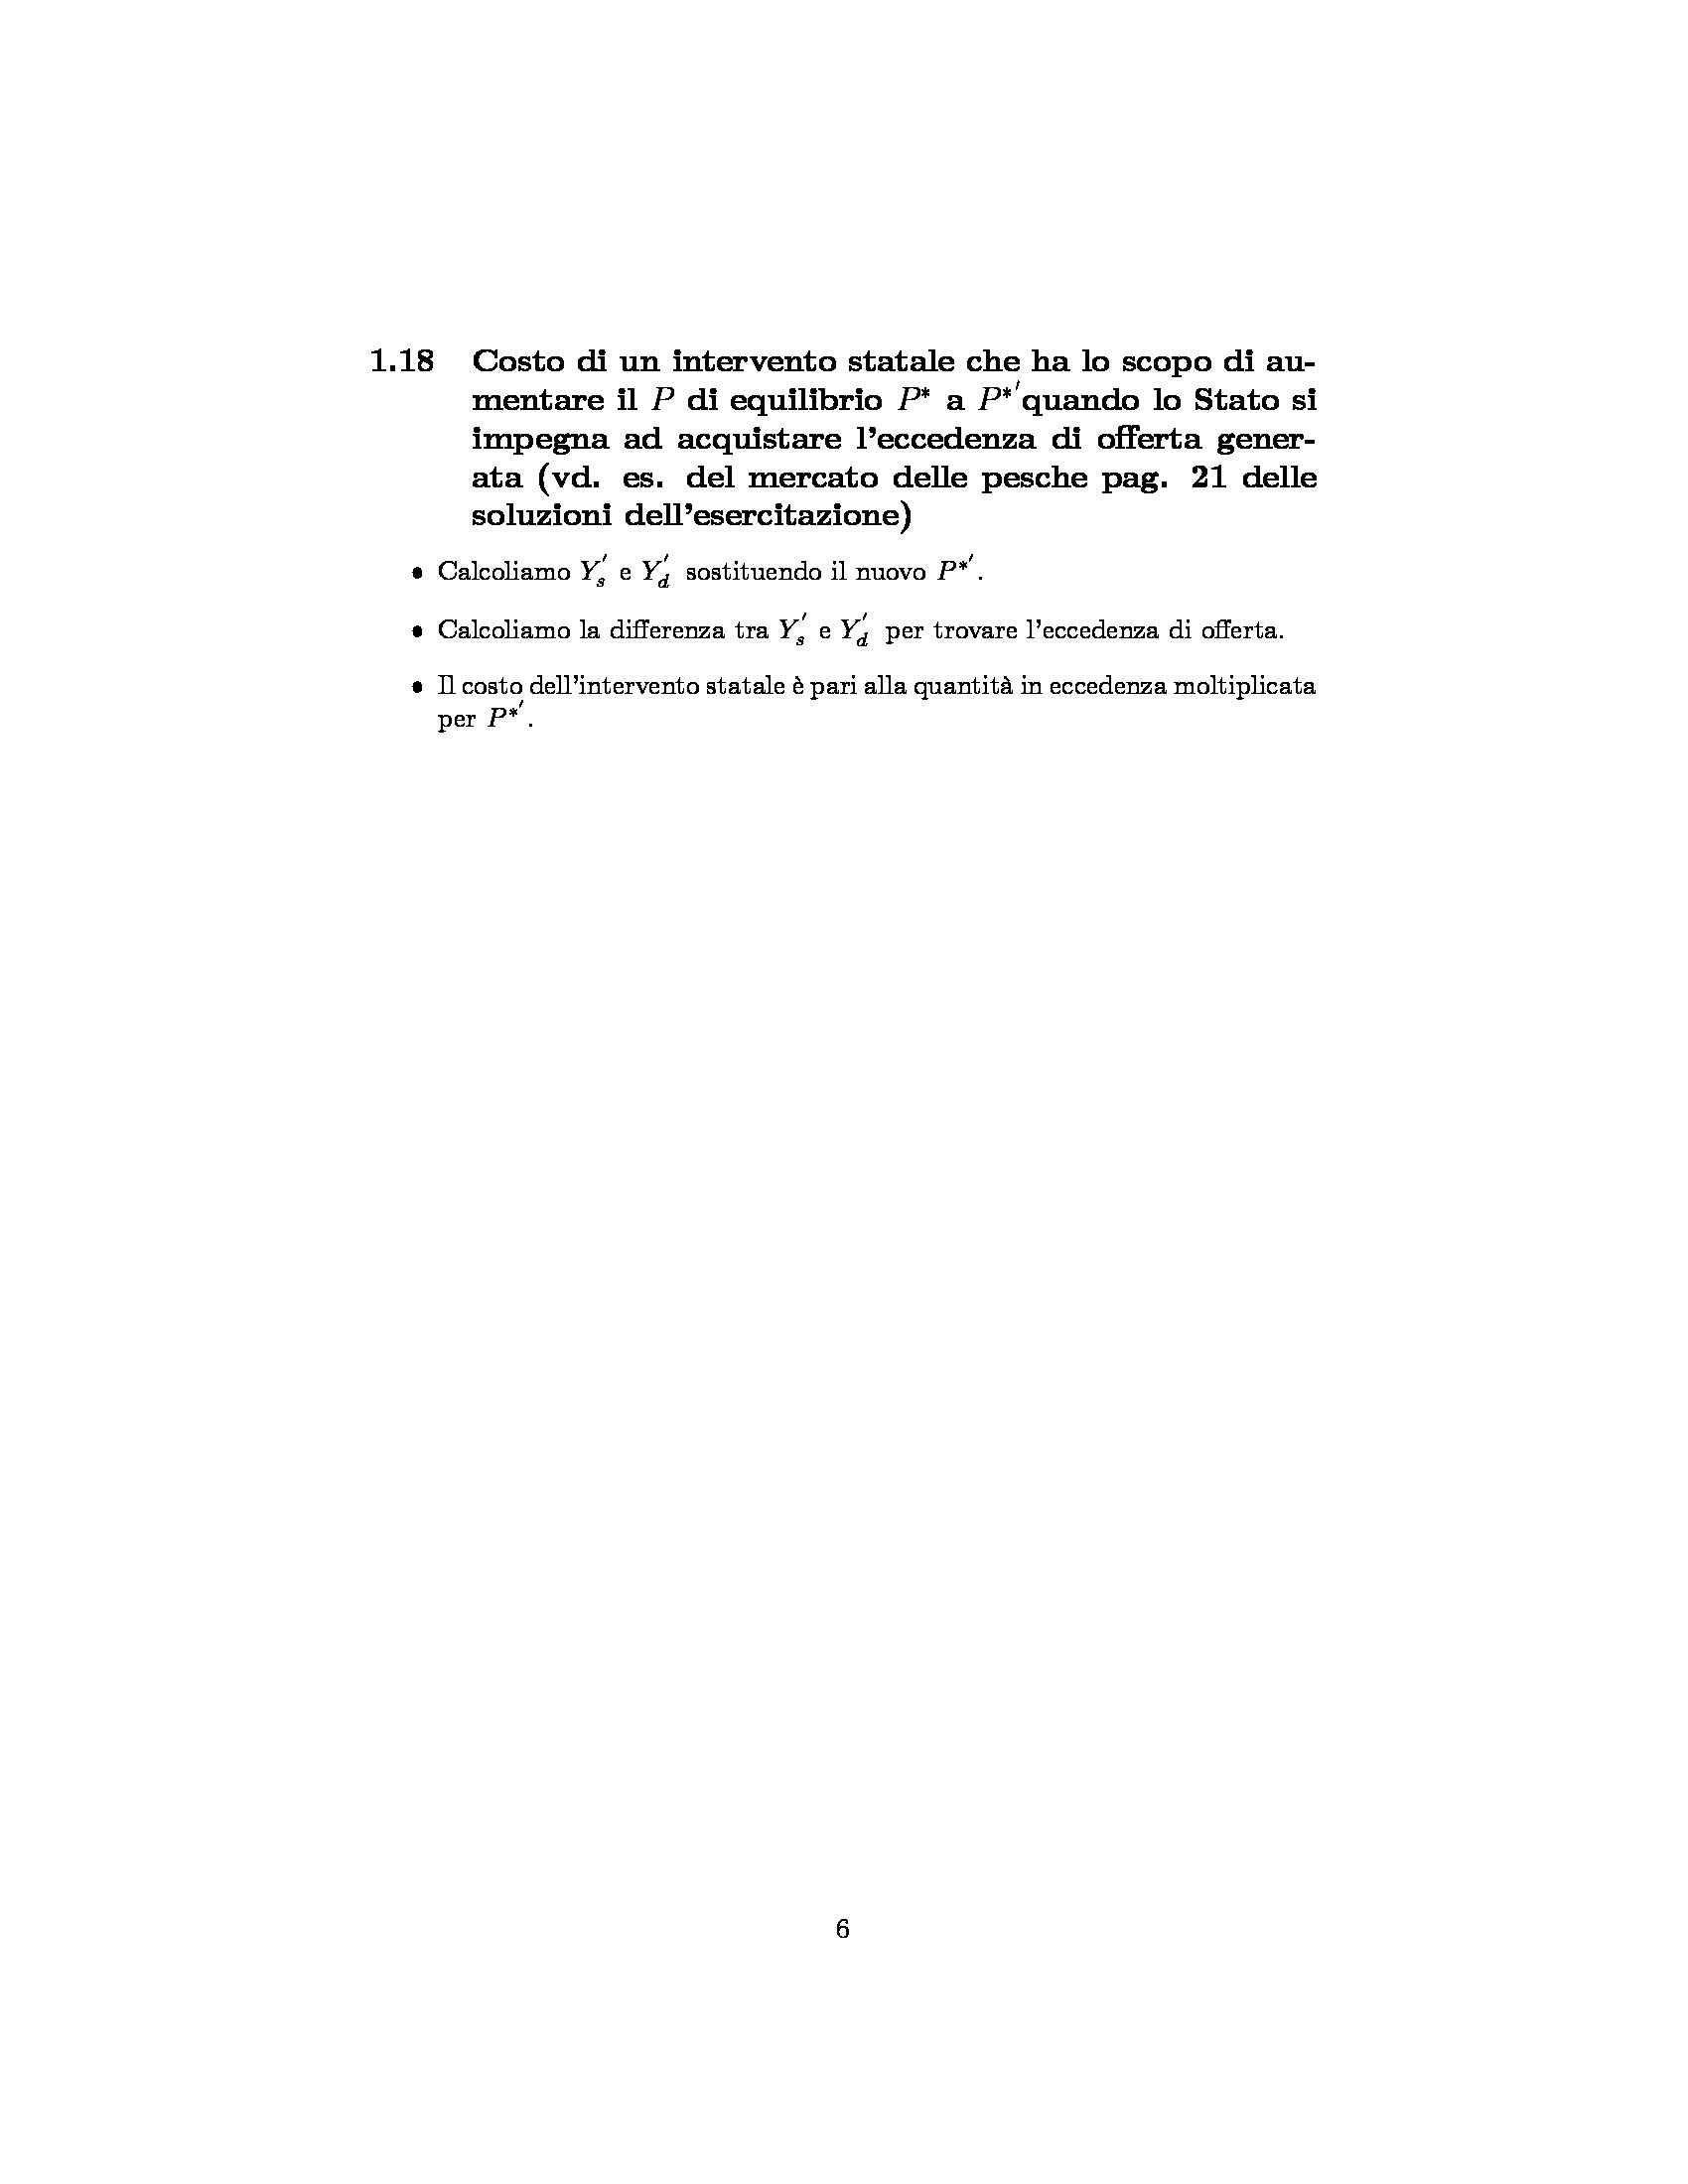 Microeconomia - Formulario Pag. 21